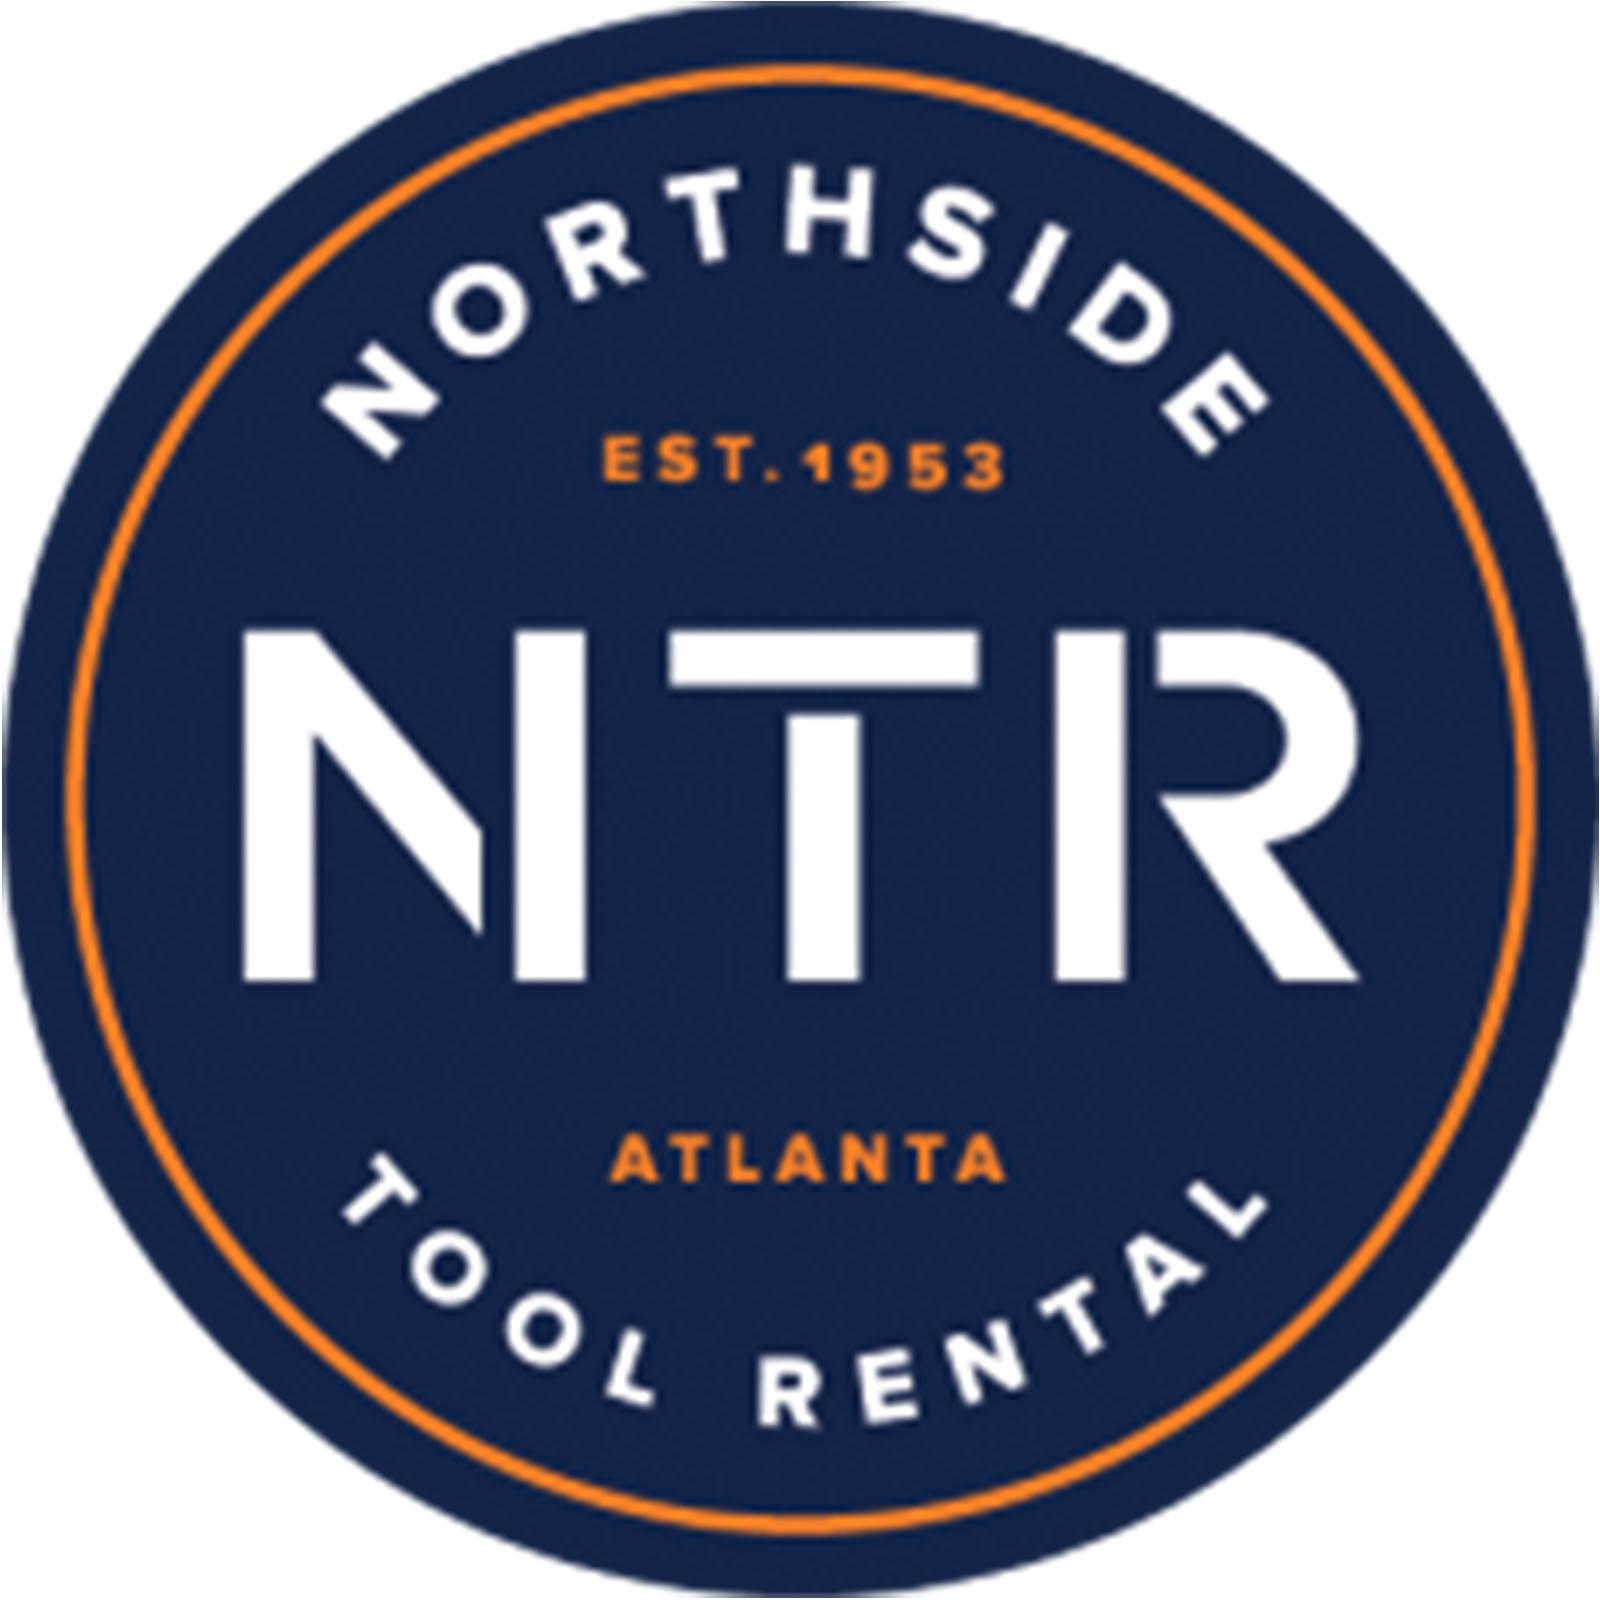 Northside Tool Rental logo